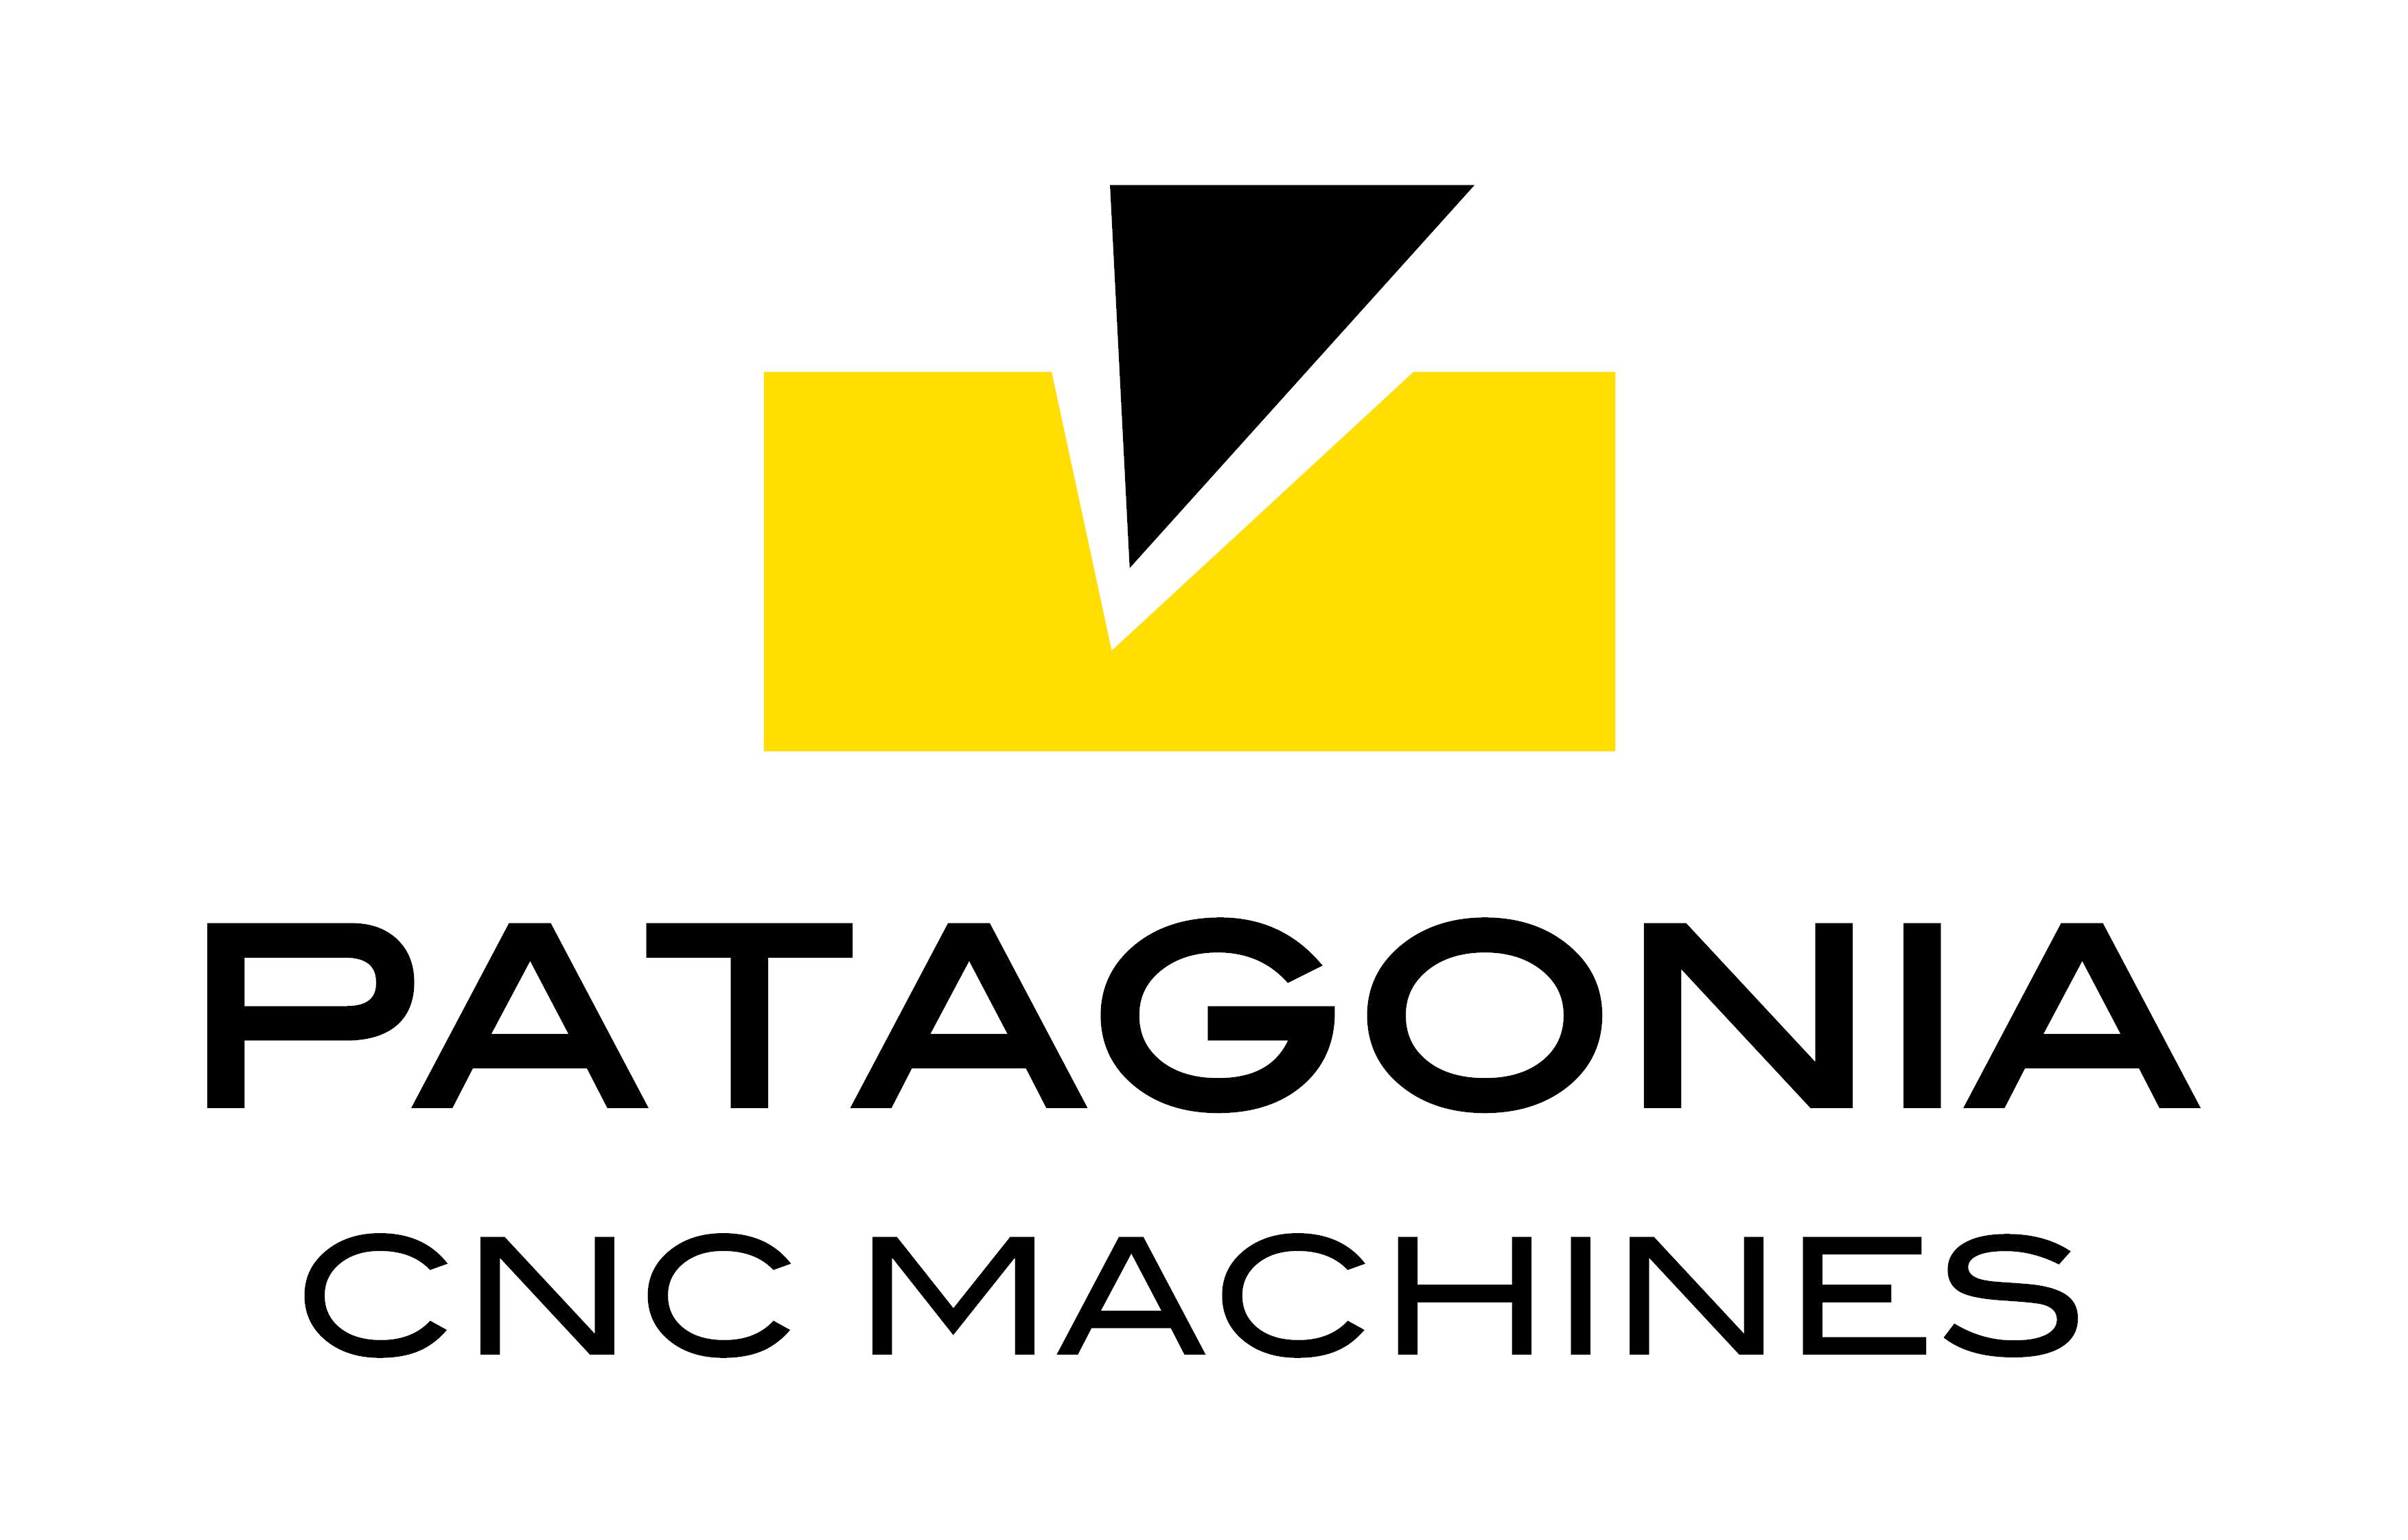 Patagonia CNC Machines – Robotica, Routers, Laser, Automatizaciones